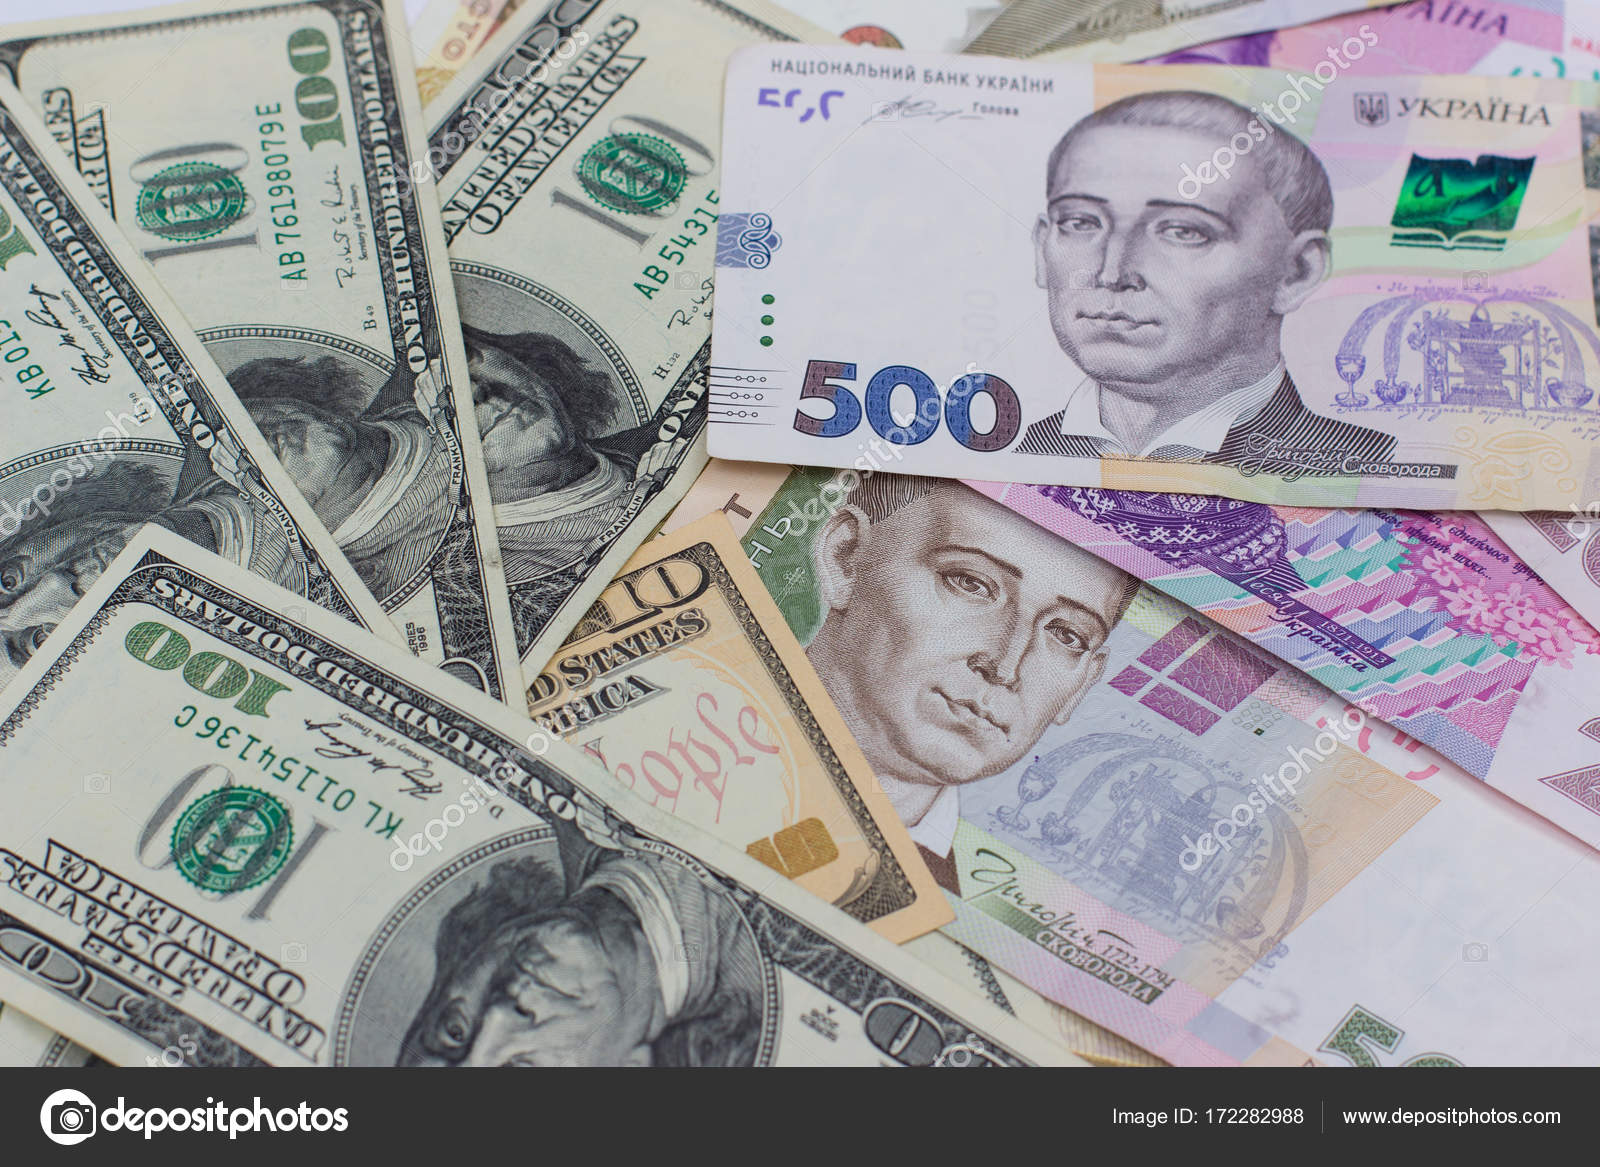 Ukrainian hryvnia to dollar 10 бонус форекс guestbook asp sent